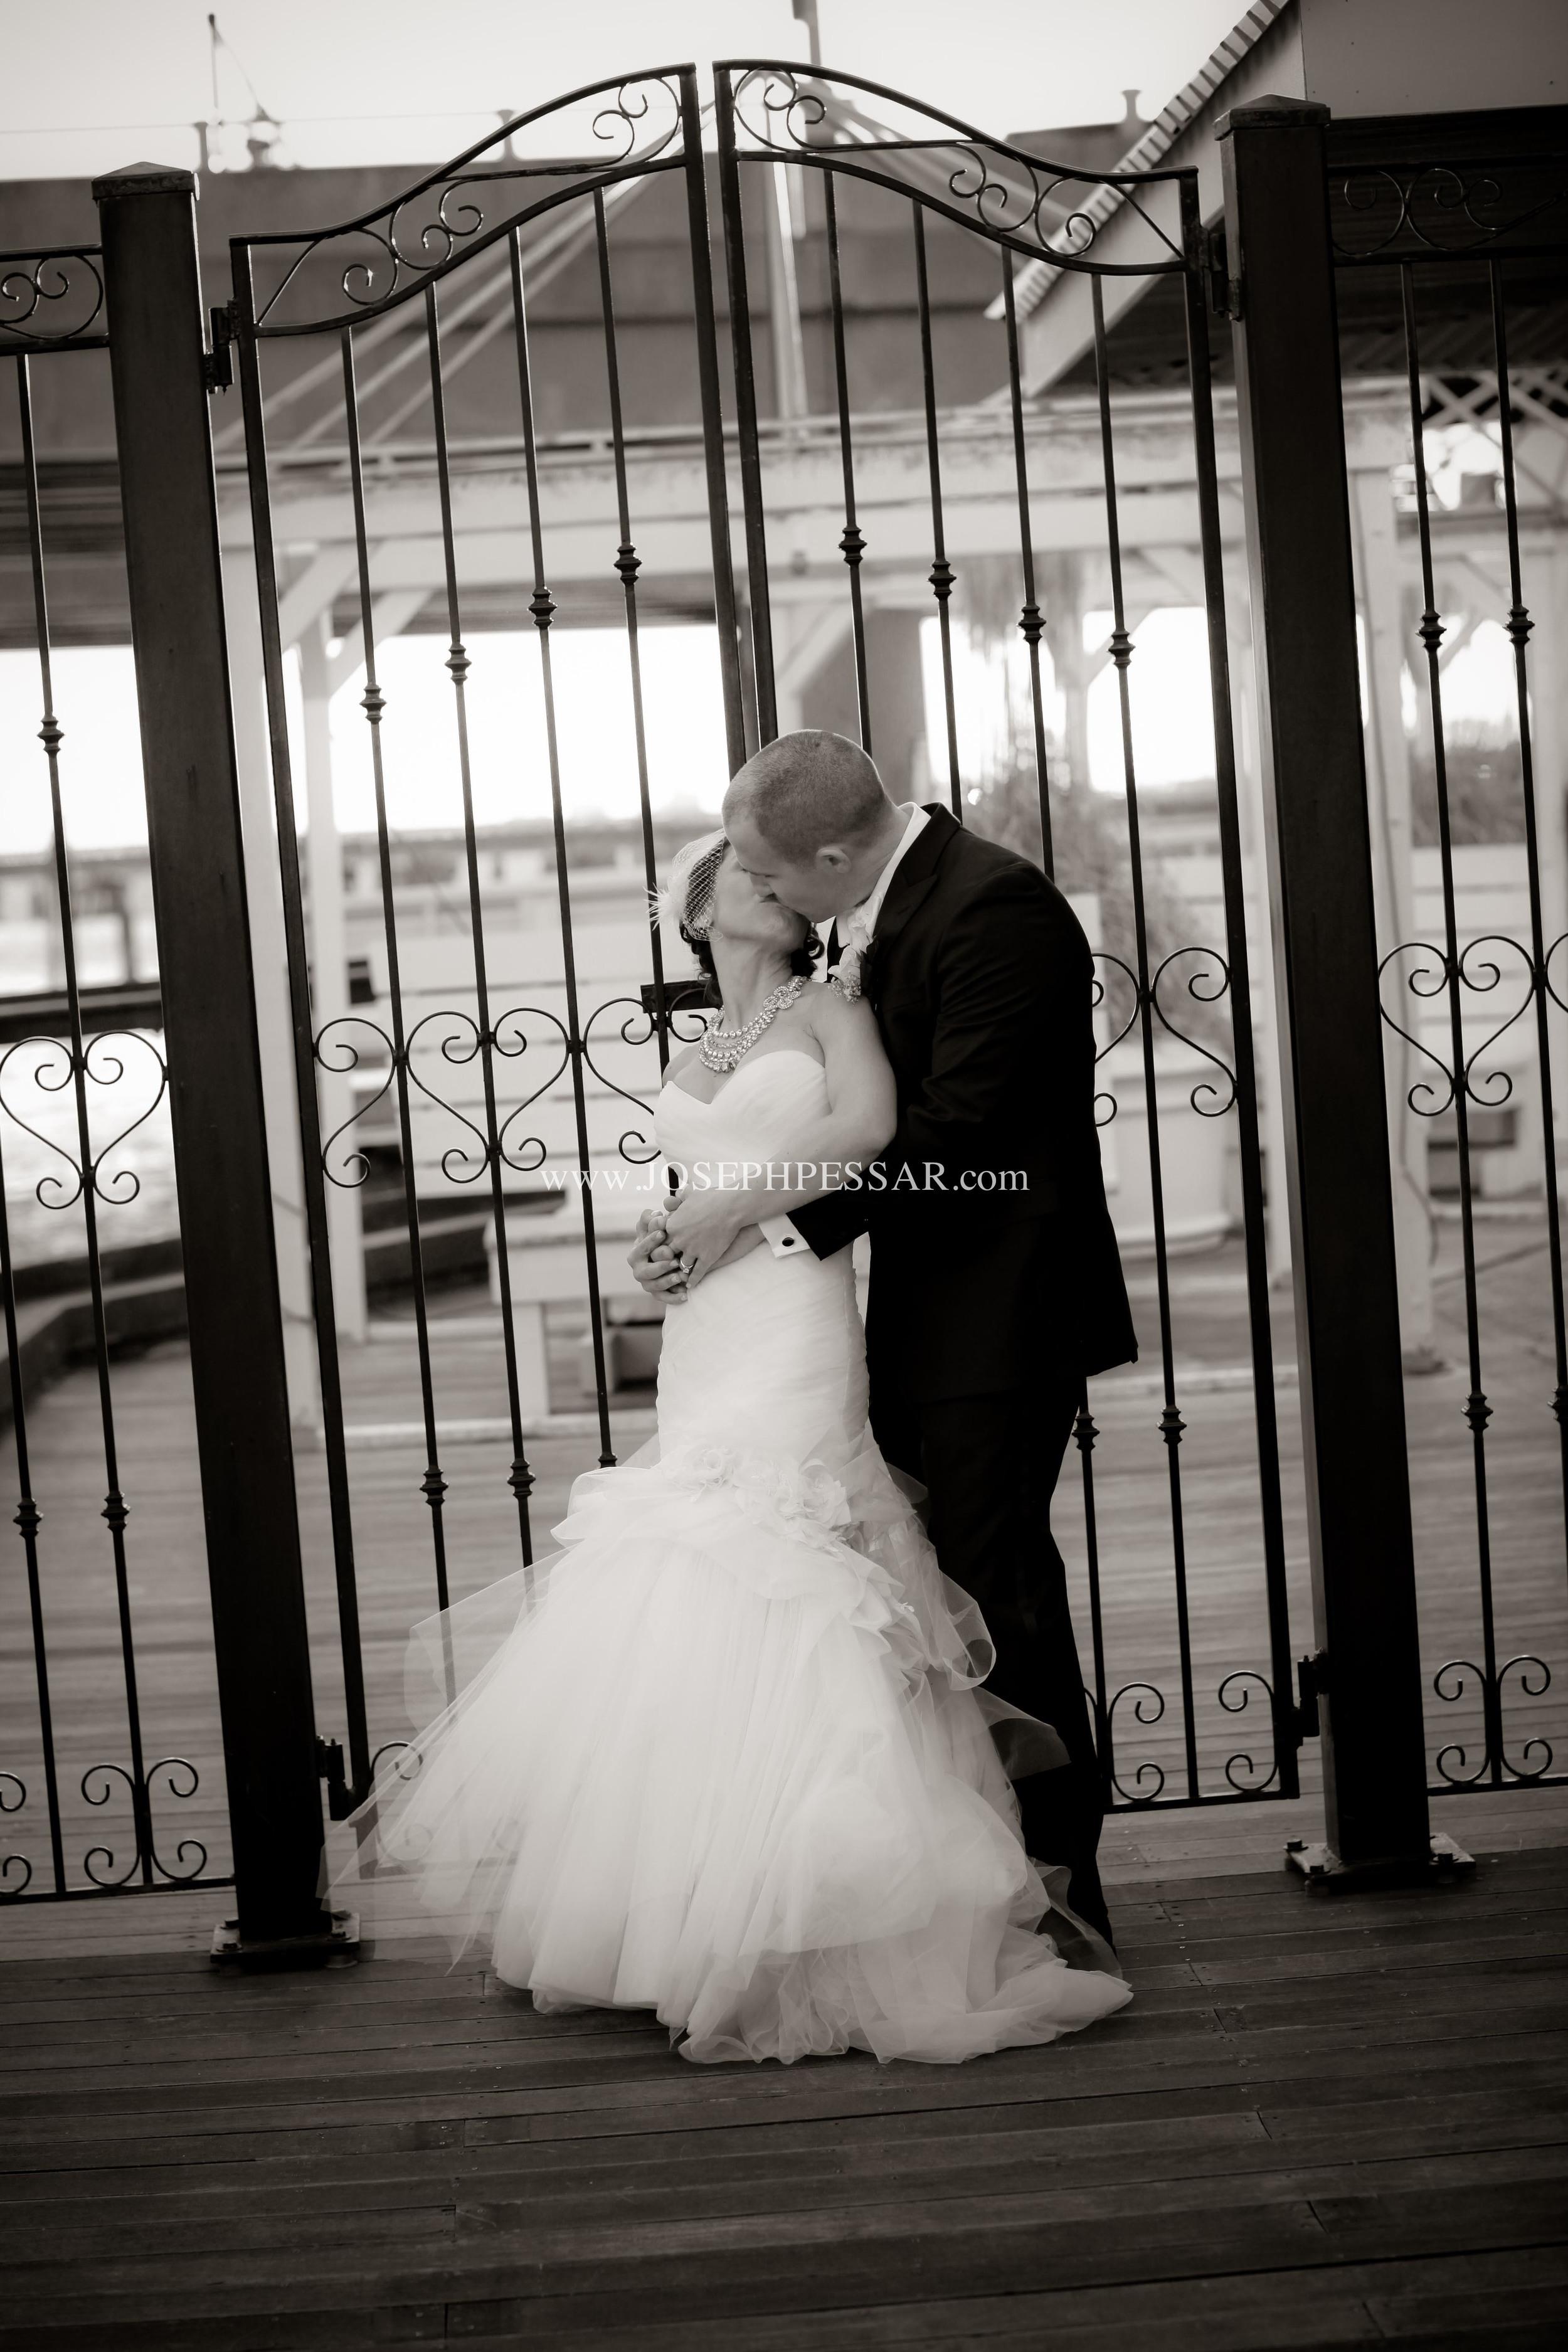 nyc_wedding_photographer0025.jpg